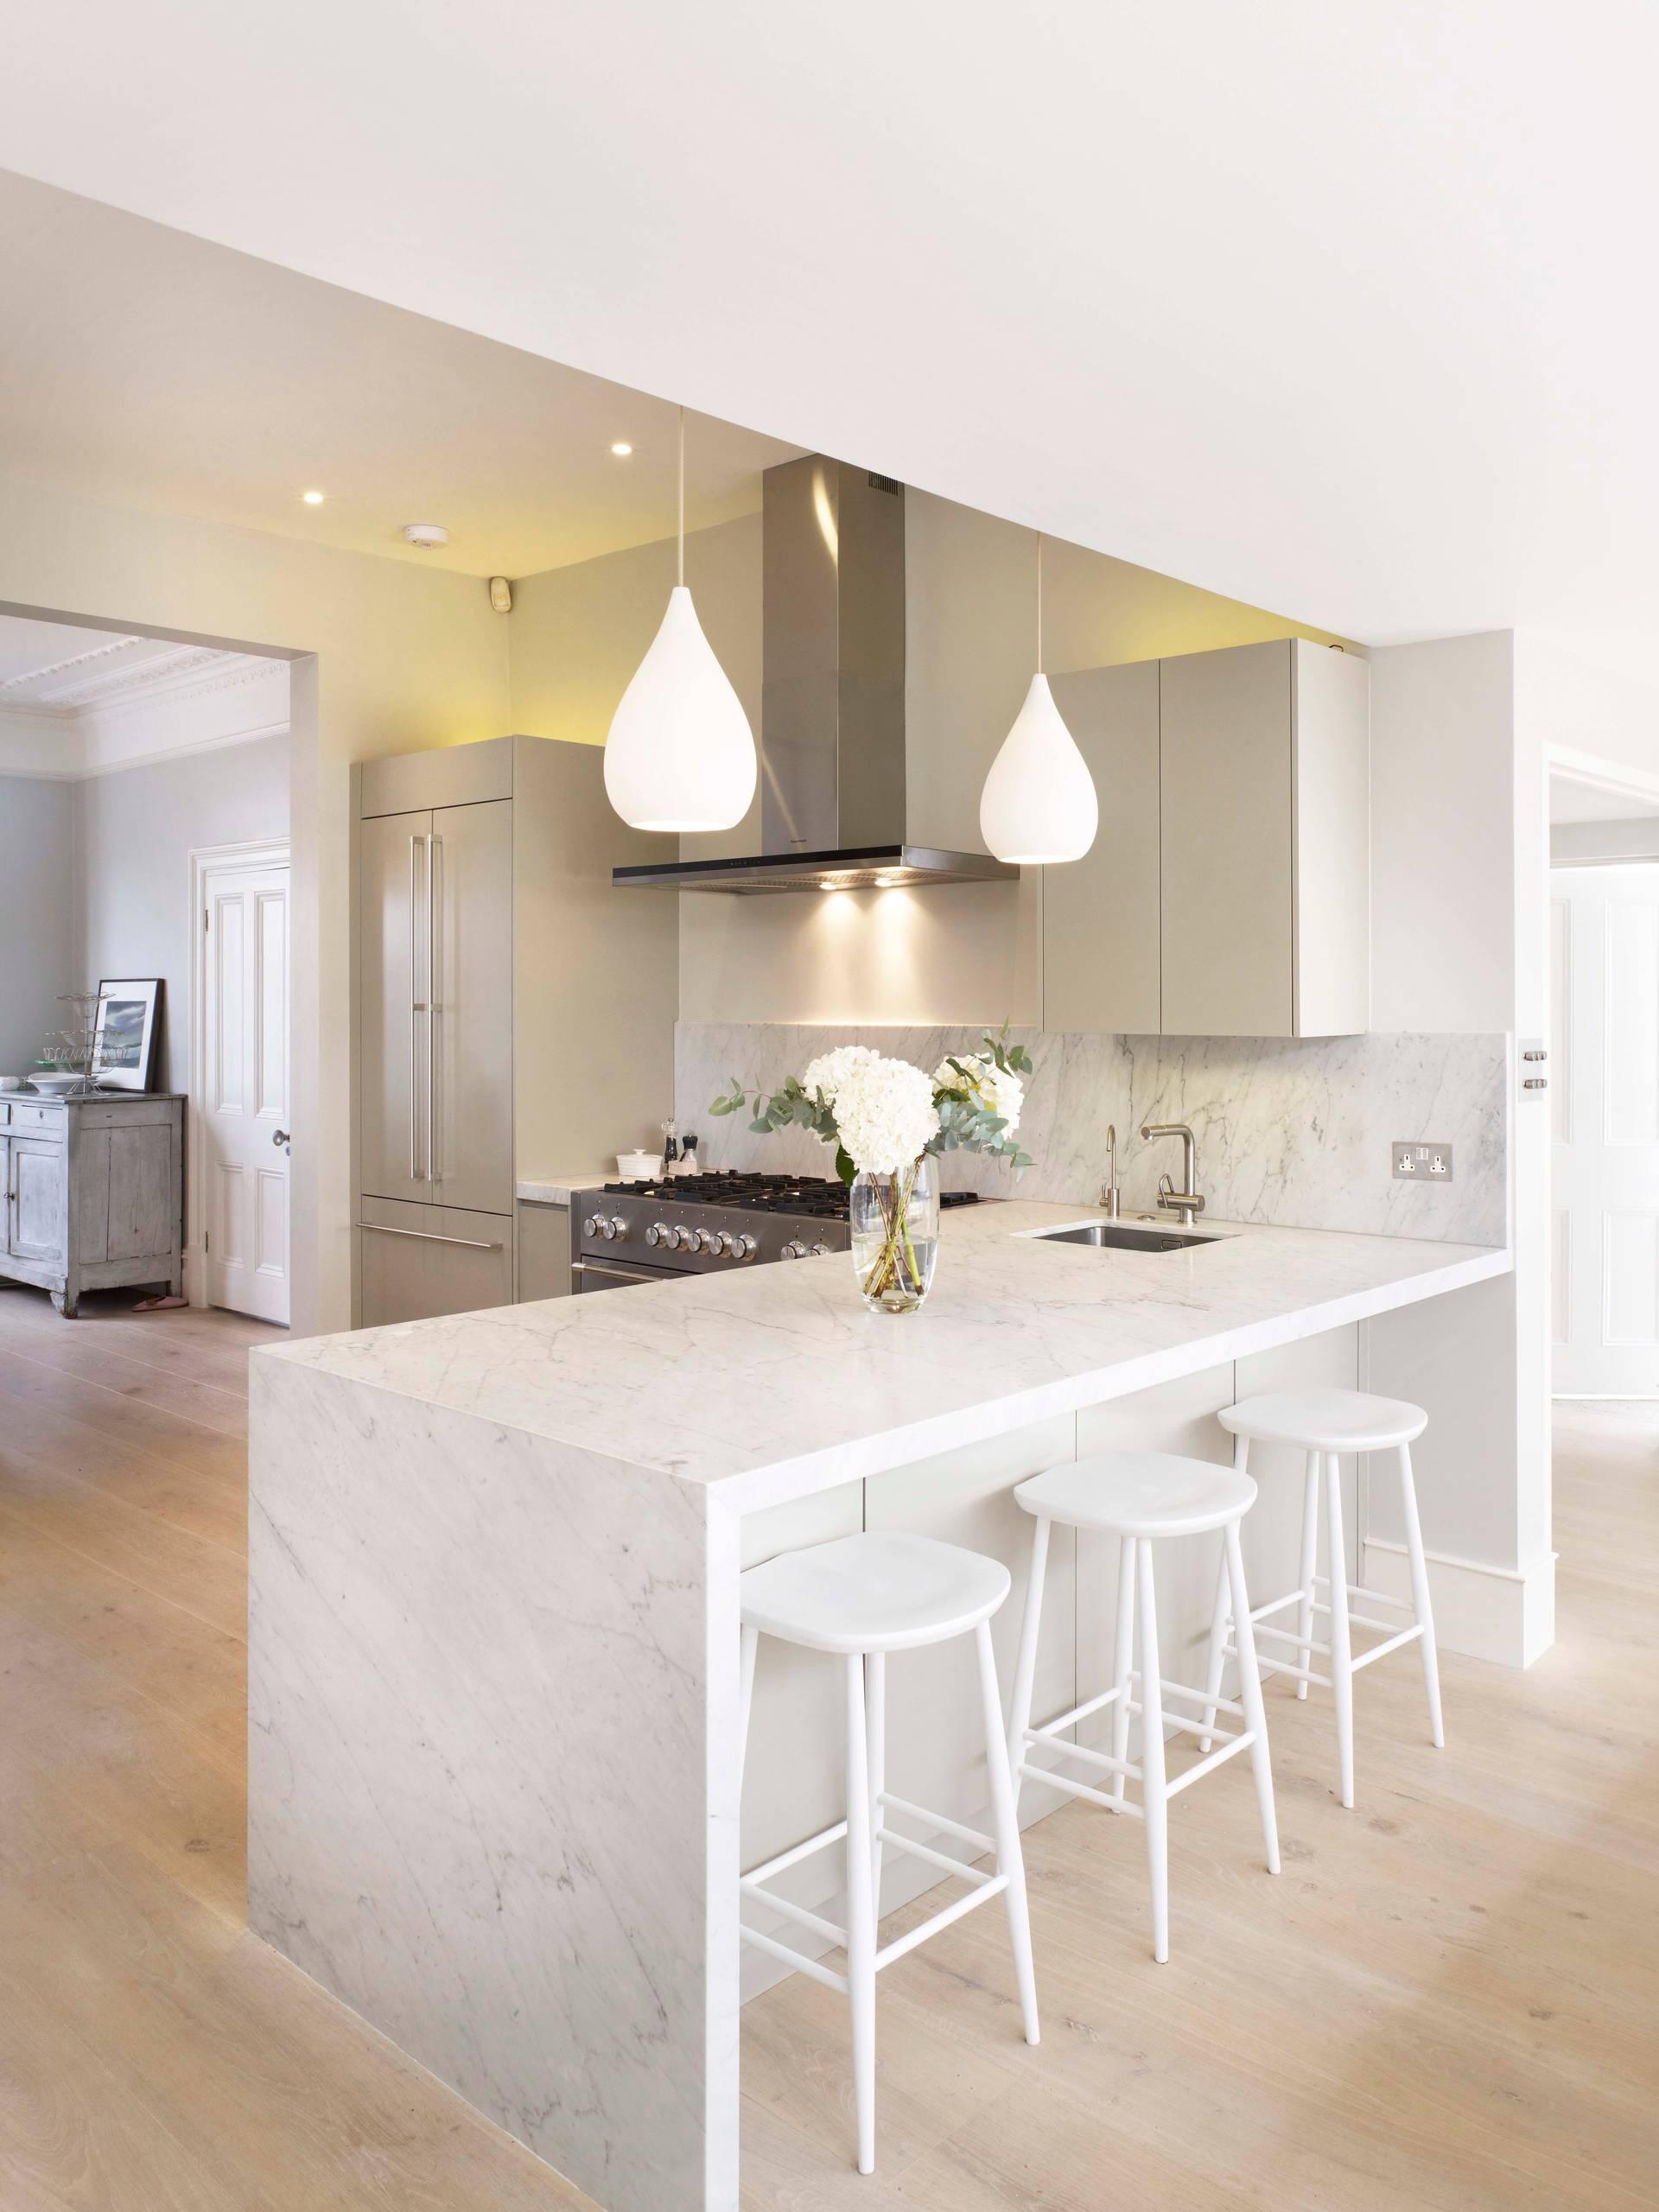 Contemporary Kitchen Marble Backsplash Kitchen Cabinets All